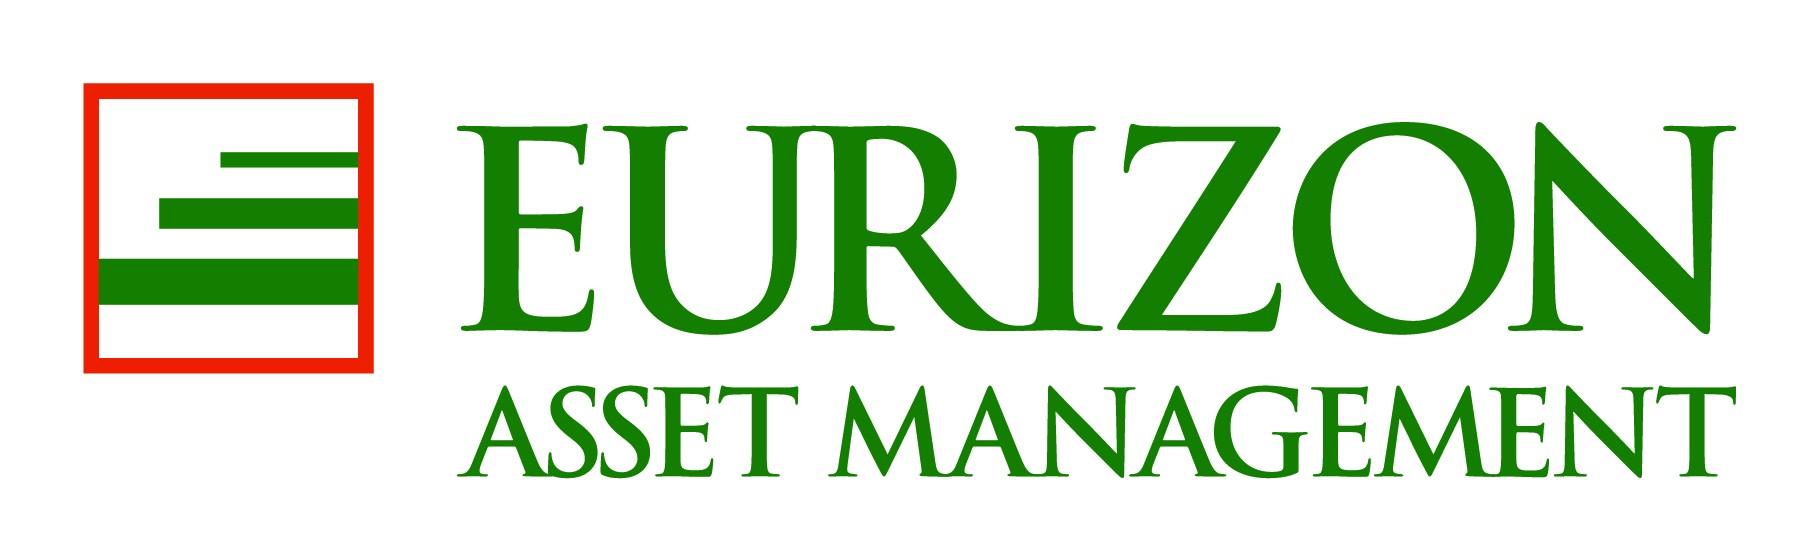 Eurizon Asset Management Slovakia, správ. spol., a.s.